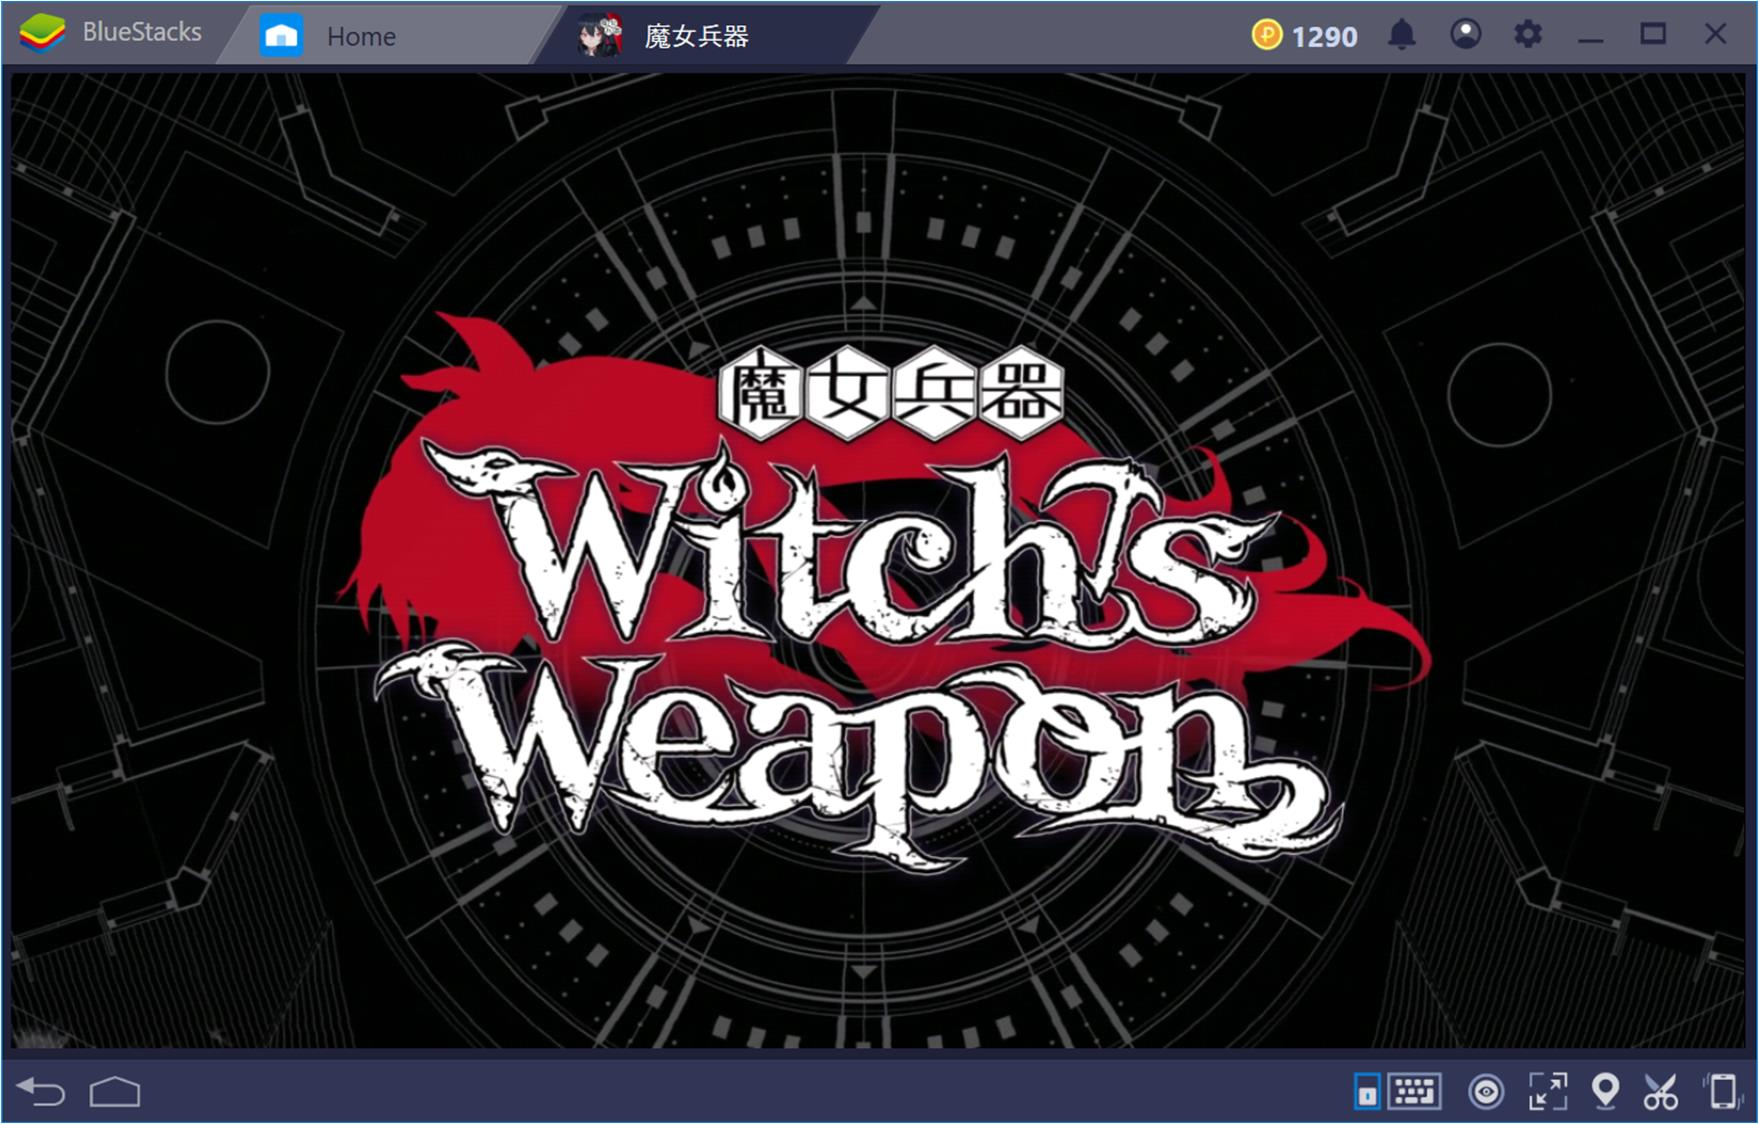 BlueStacksを使ってPCで Witch's Weapon – 魔女兵器 を遊ぼう